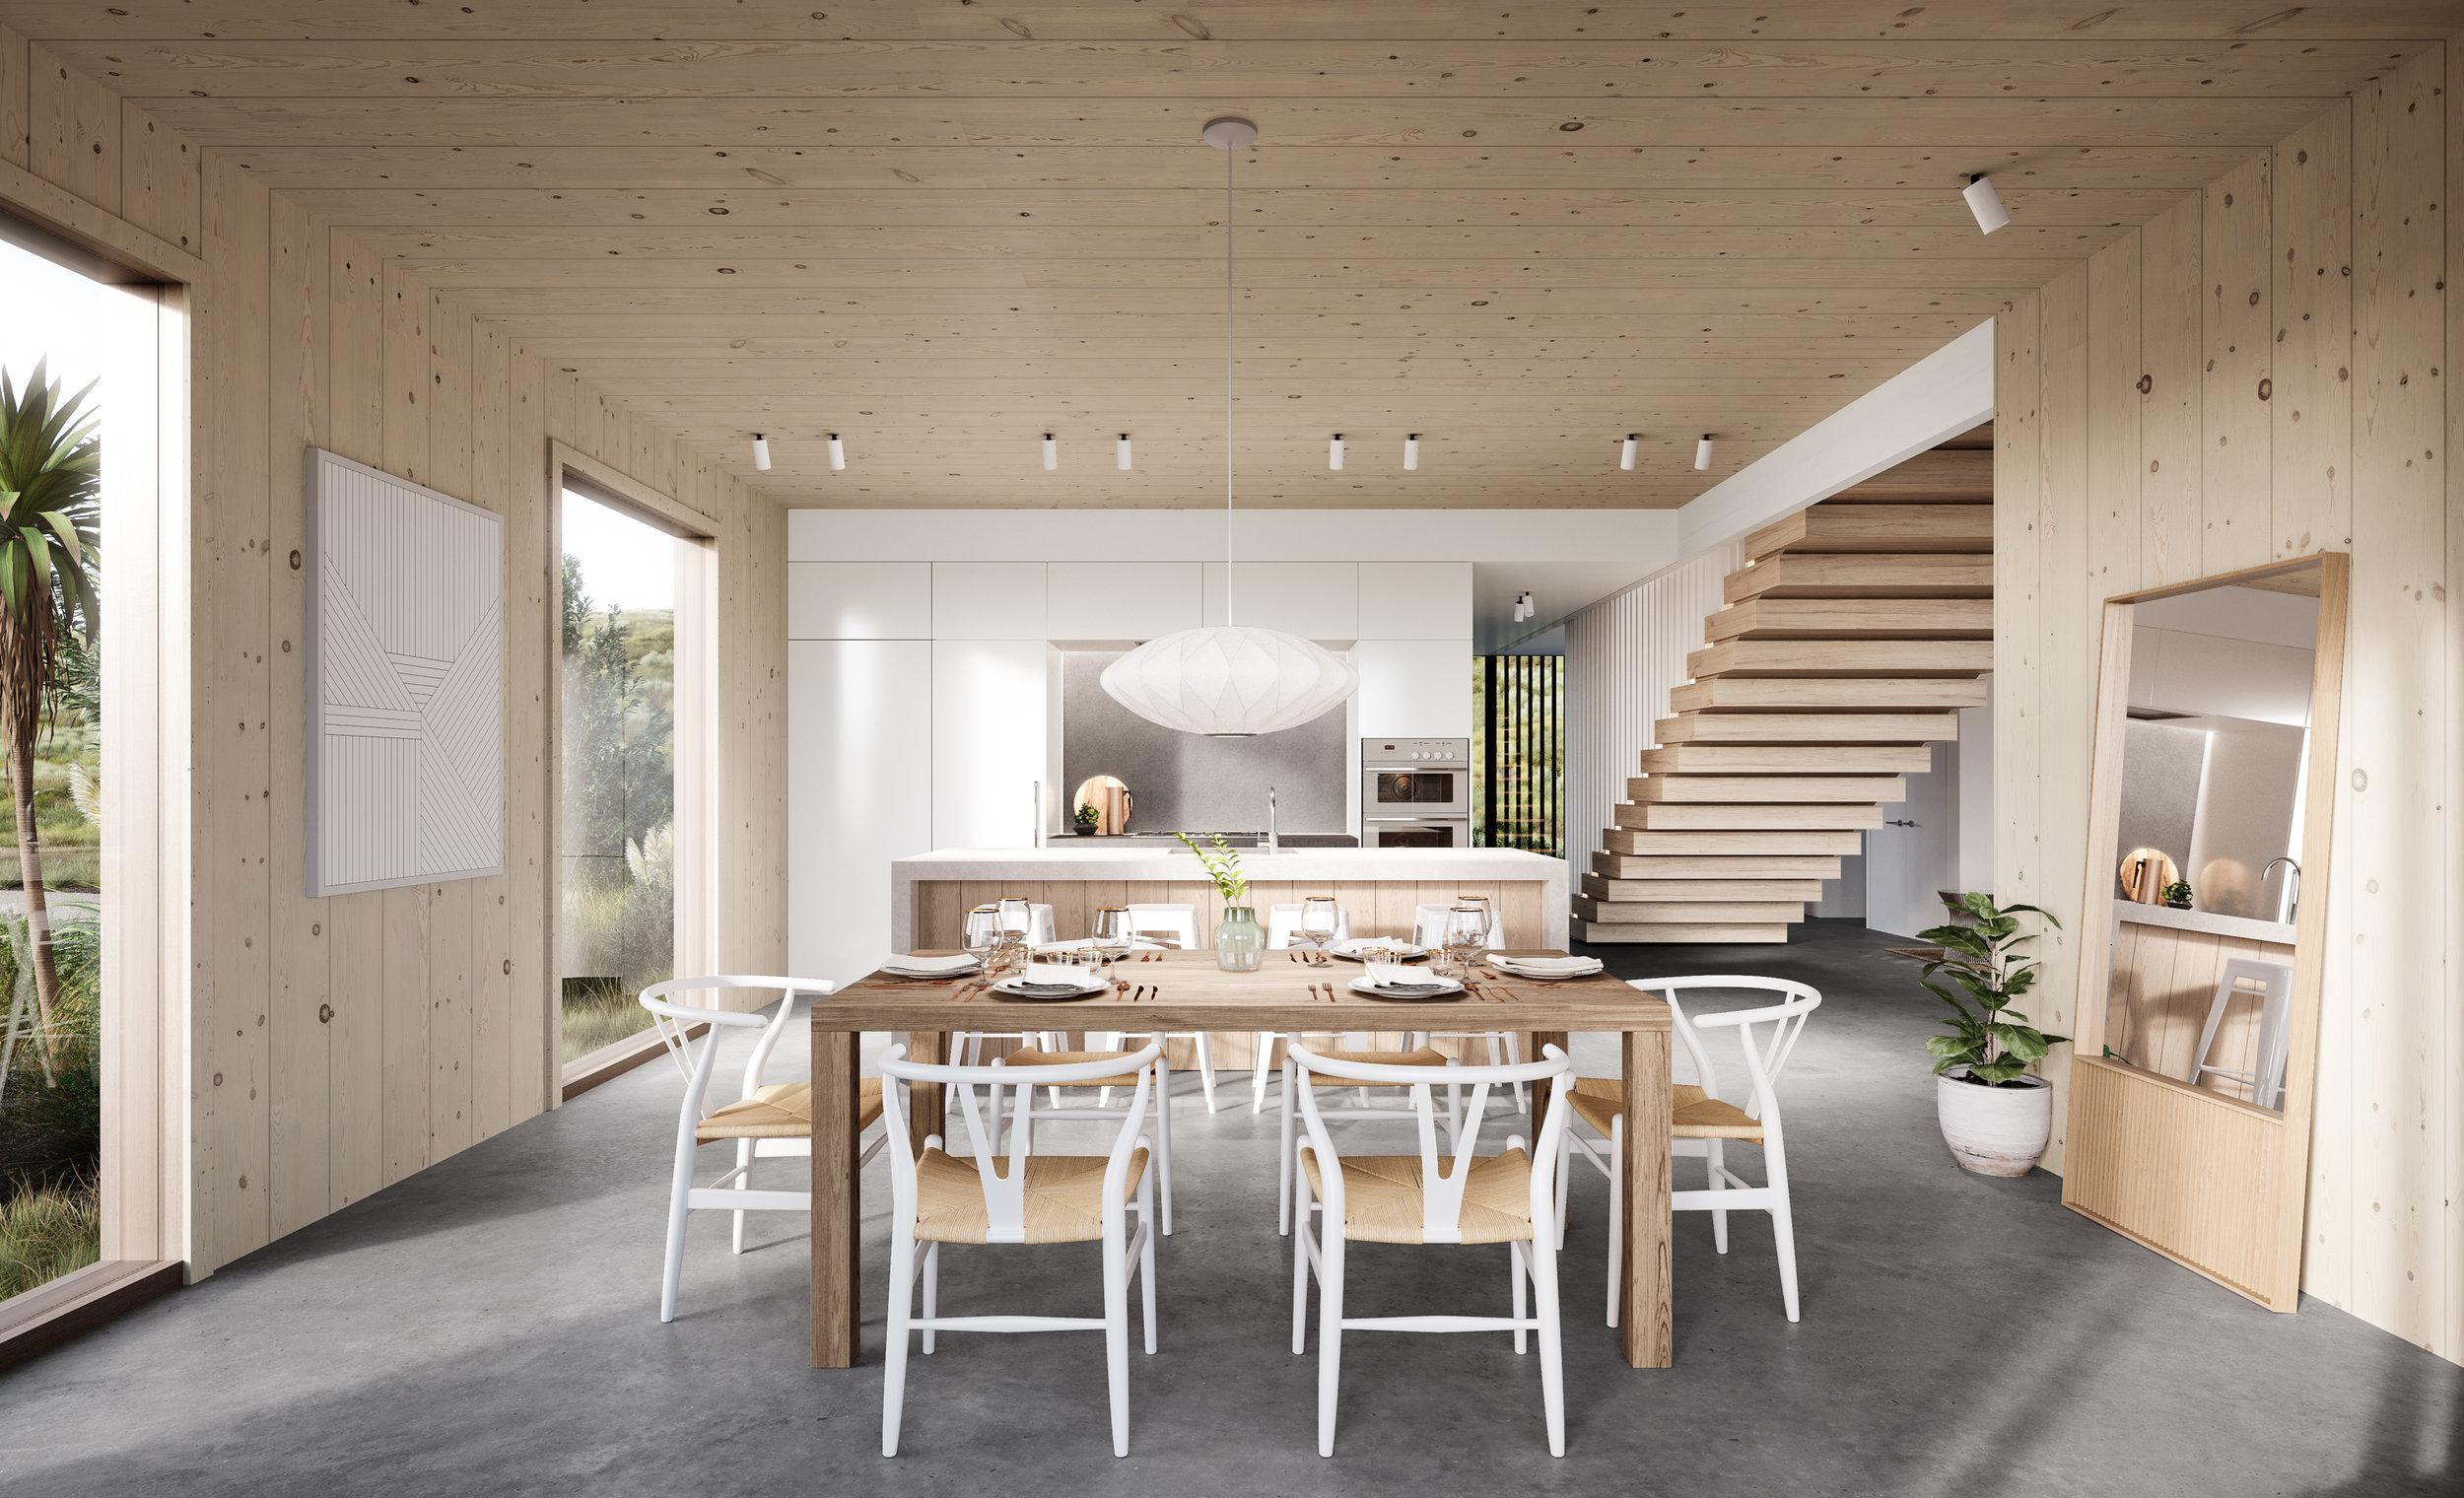 DARB_Tara Iti Sandhills 2 Bedroom Cottage Kitchen.jpg